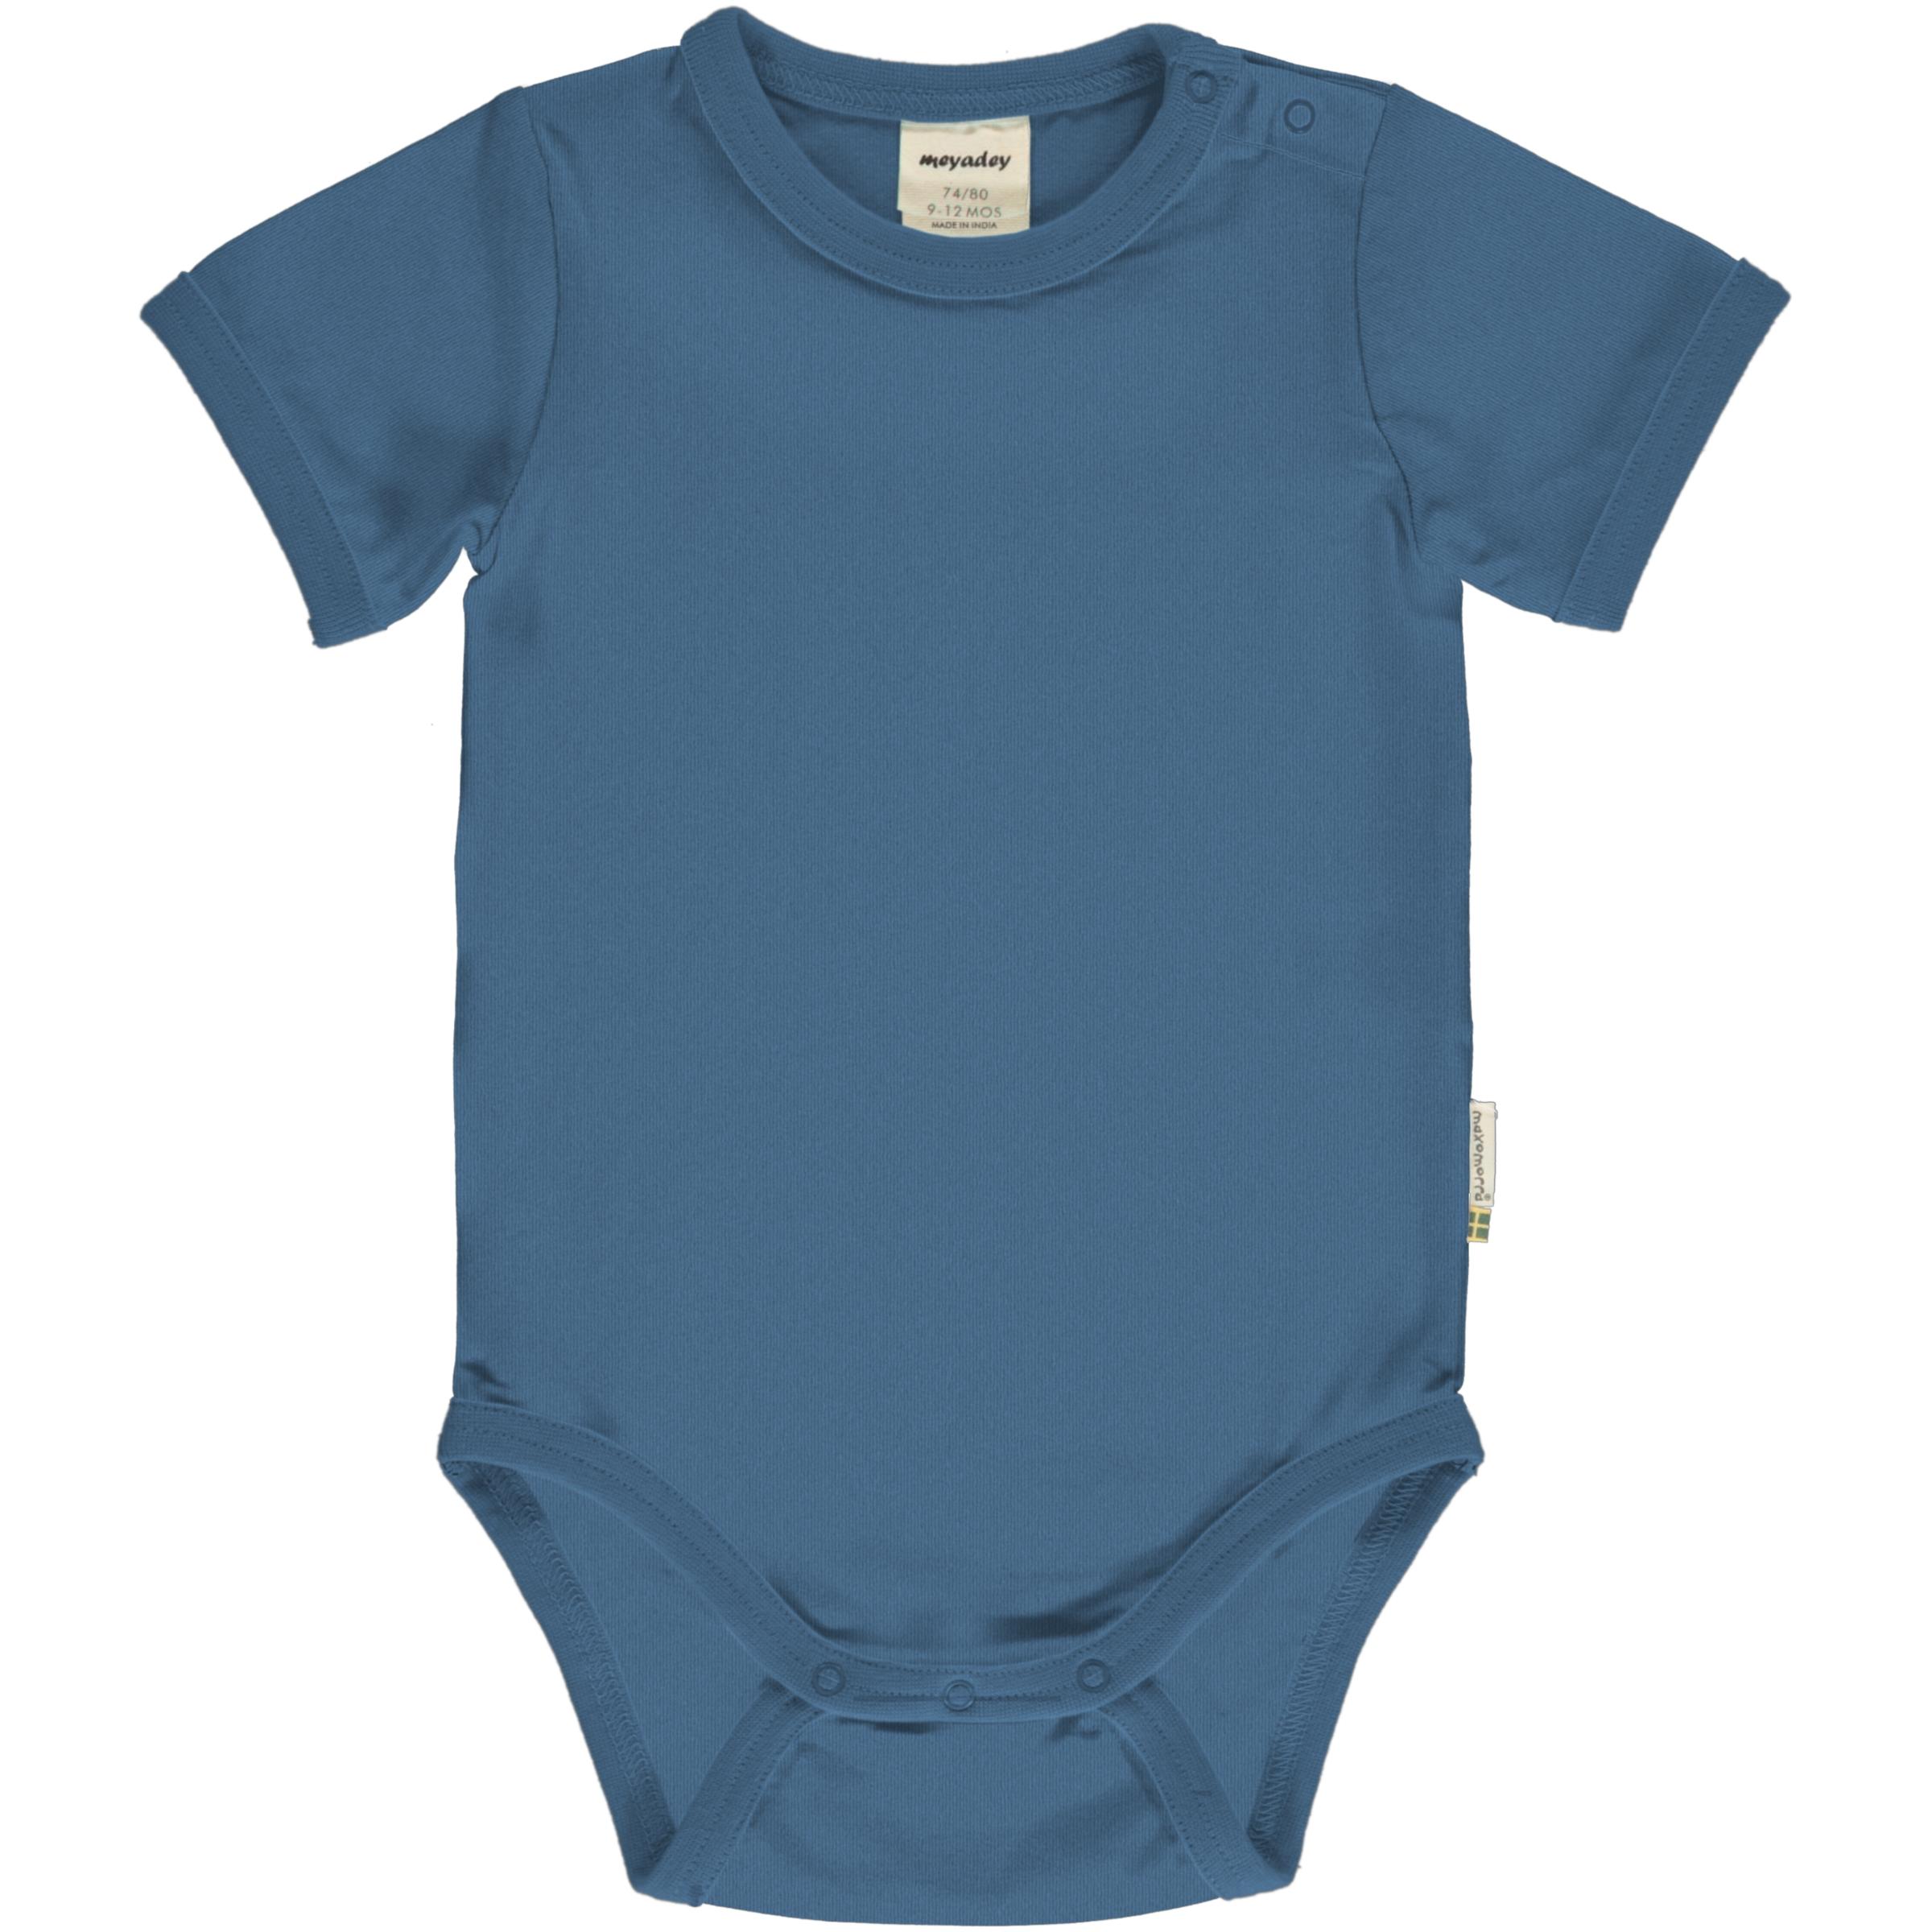 Meyadey by Maxomorra Baby Body kurzarm Solid MOONLIGHT BLUE 062/068